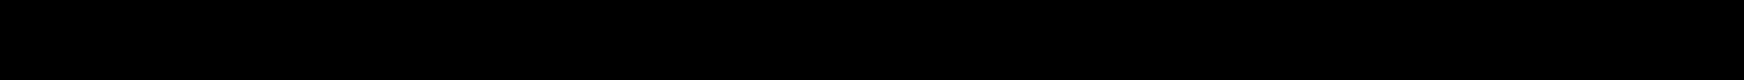 NeutrafaceSlabDisGR-Thin.otf